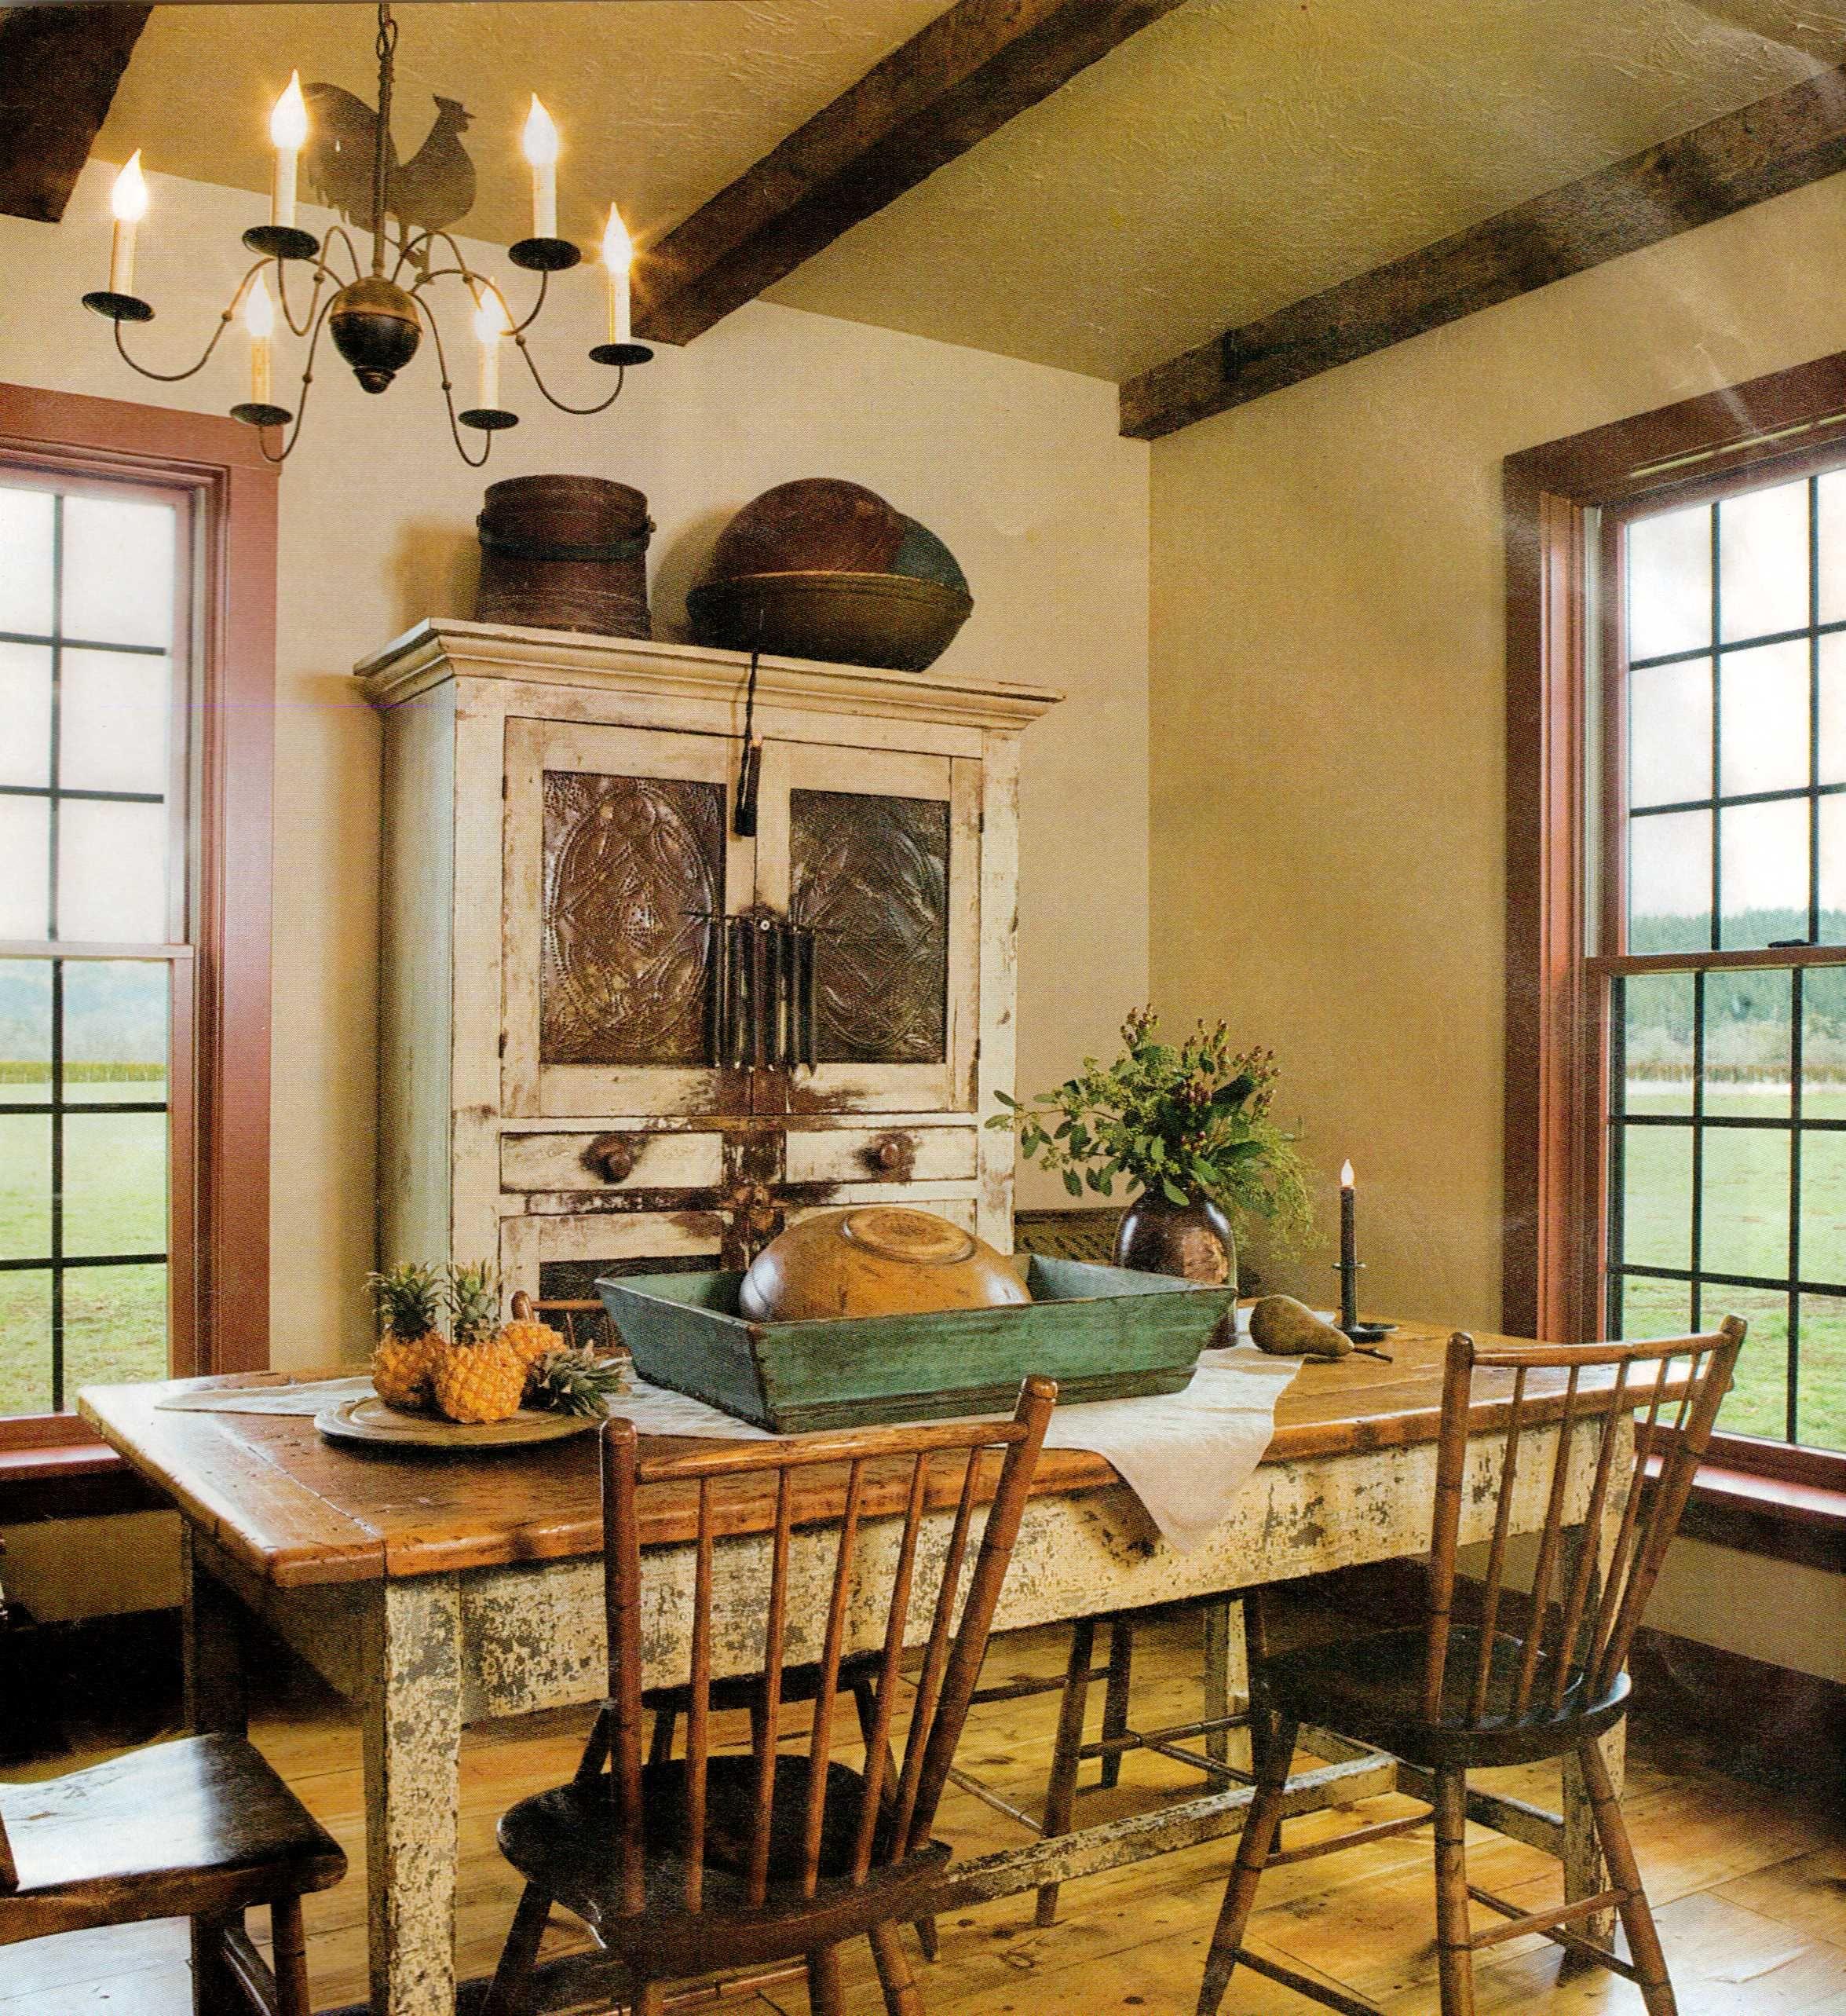 Prim Chippy Table U0026 Old Cupboard With Punched Tin Doors...beamed Ceilings.  ZuhauseFarbenStilSchlichte KüchenPrimitive ...